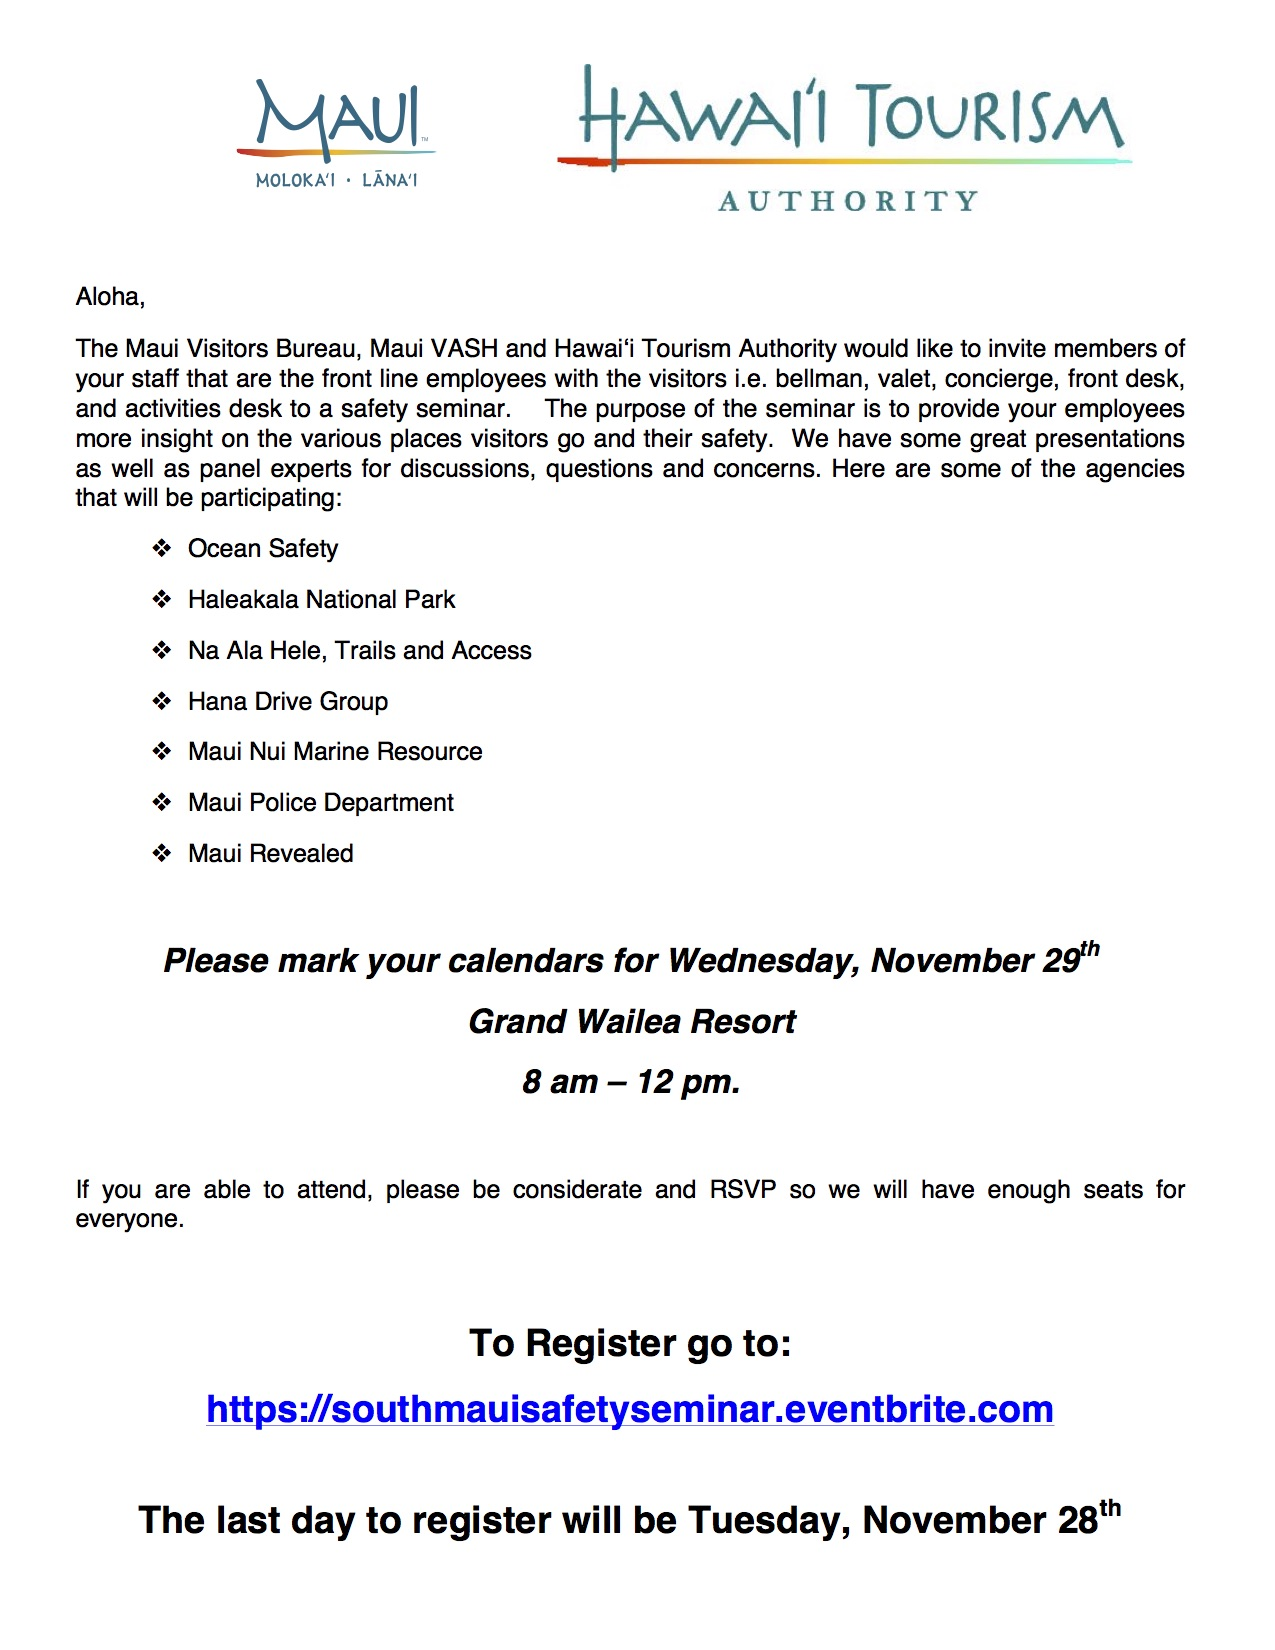 Wailea Invitation letter.jpg